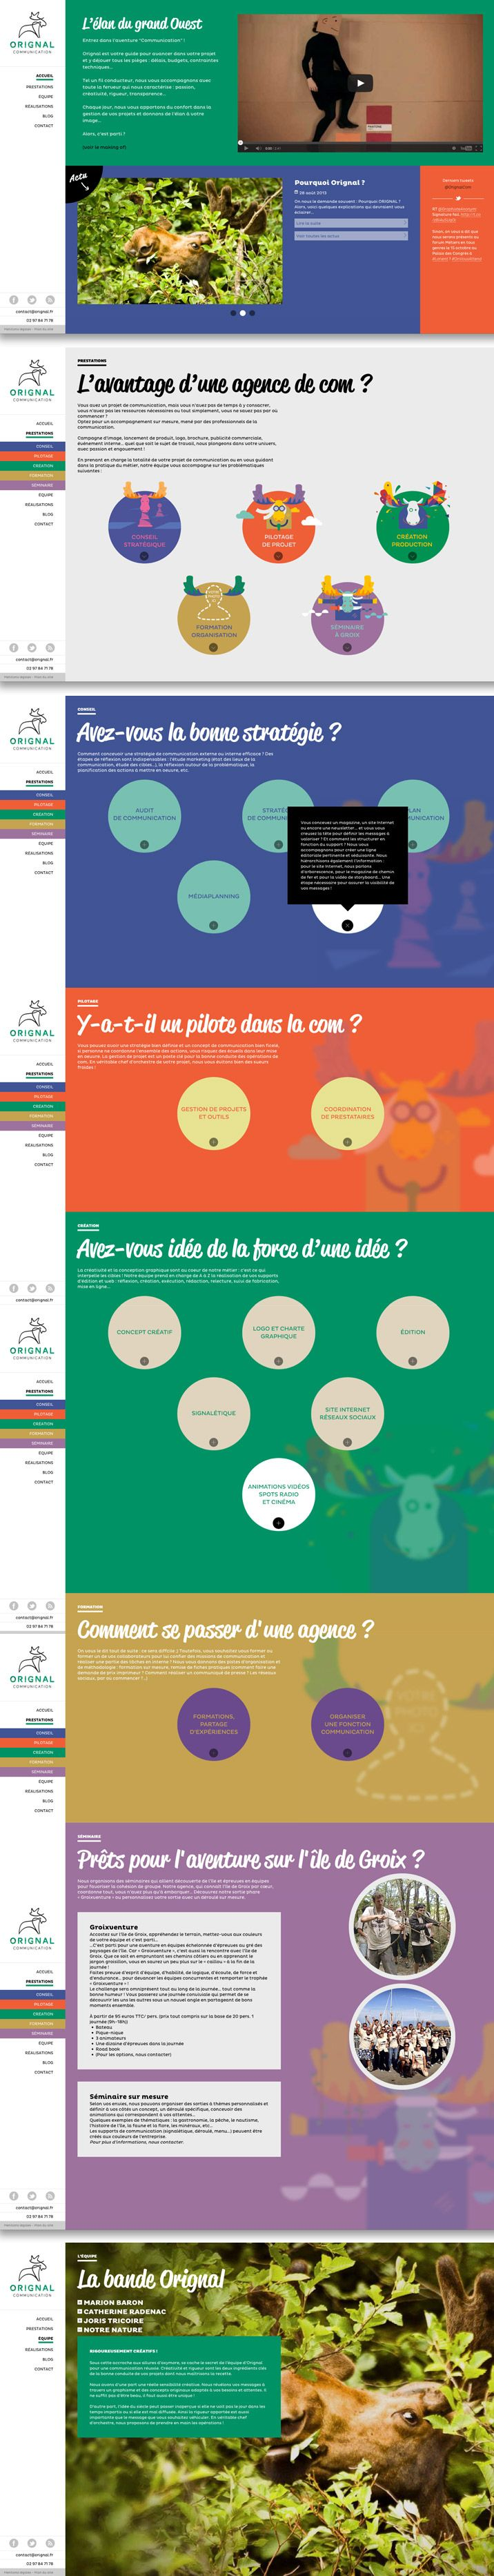 Winner 11 October 2013 Orignal communication by Orignal communication http://www.cssdesignawards.com/css-web-design-award-winner.php?id=23348 The fullscreen responsive website of a creative Britanny agency. #Responsive #Colorful #FlatDesign #Scroll #WebAward